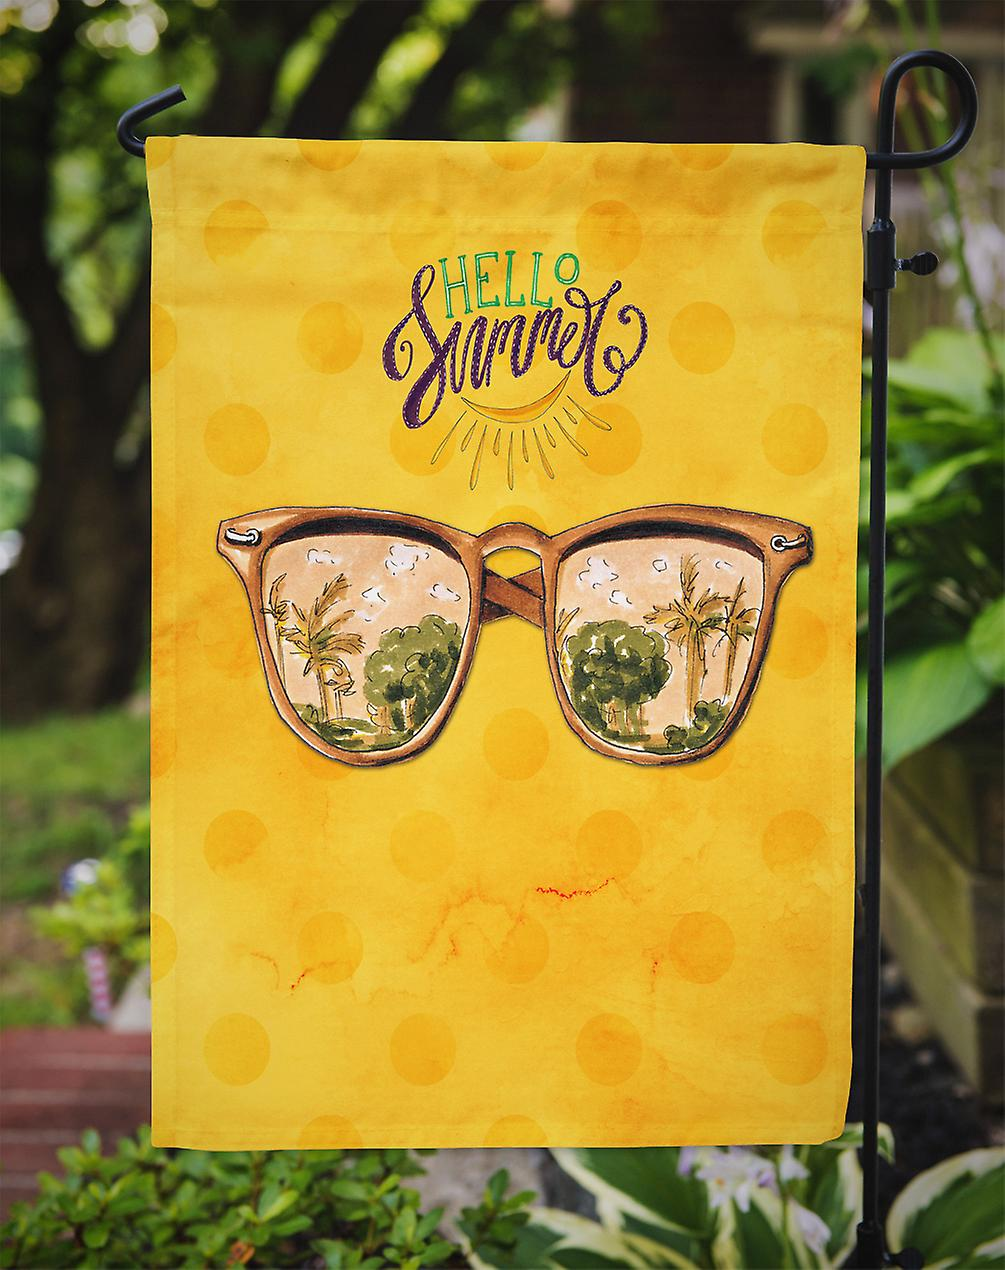 c284a6ab3a89 Carolineøerne skatte BB8207GF Beach solbriller gul Polkadot Flag Garden  størrelse